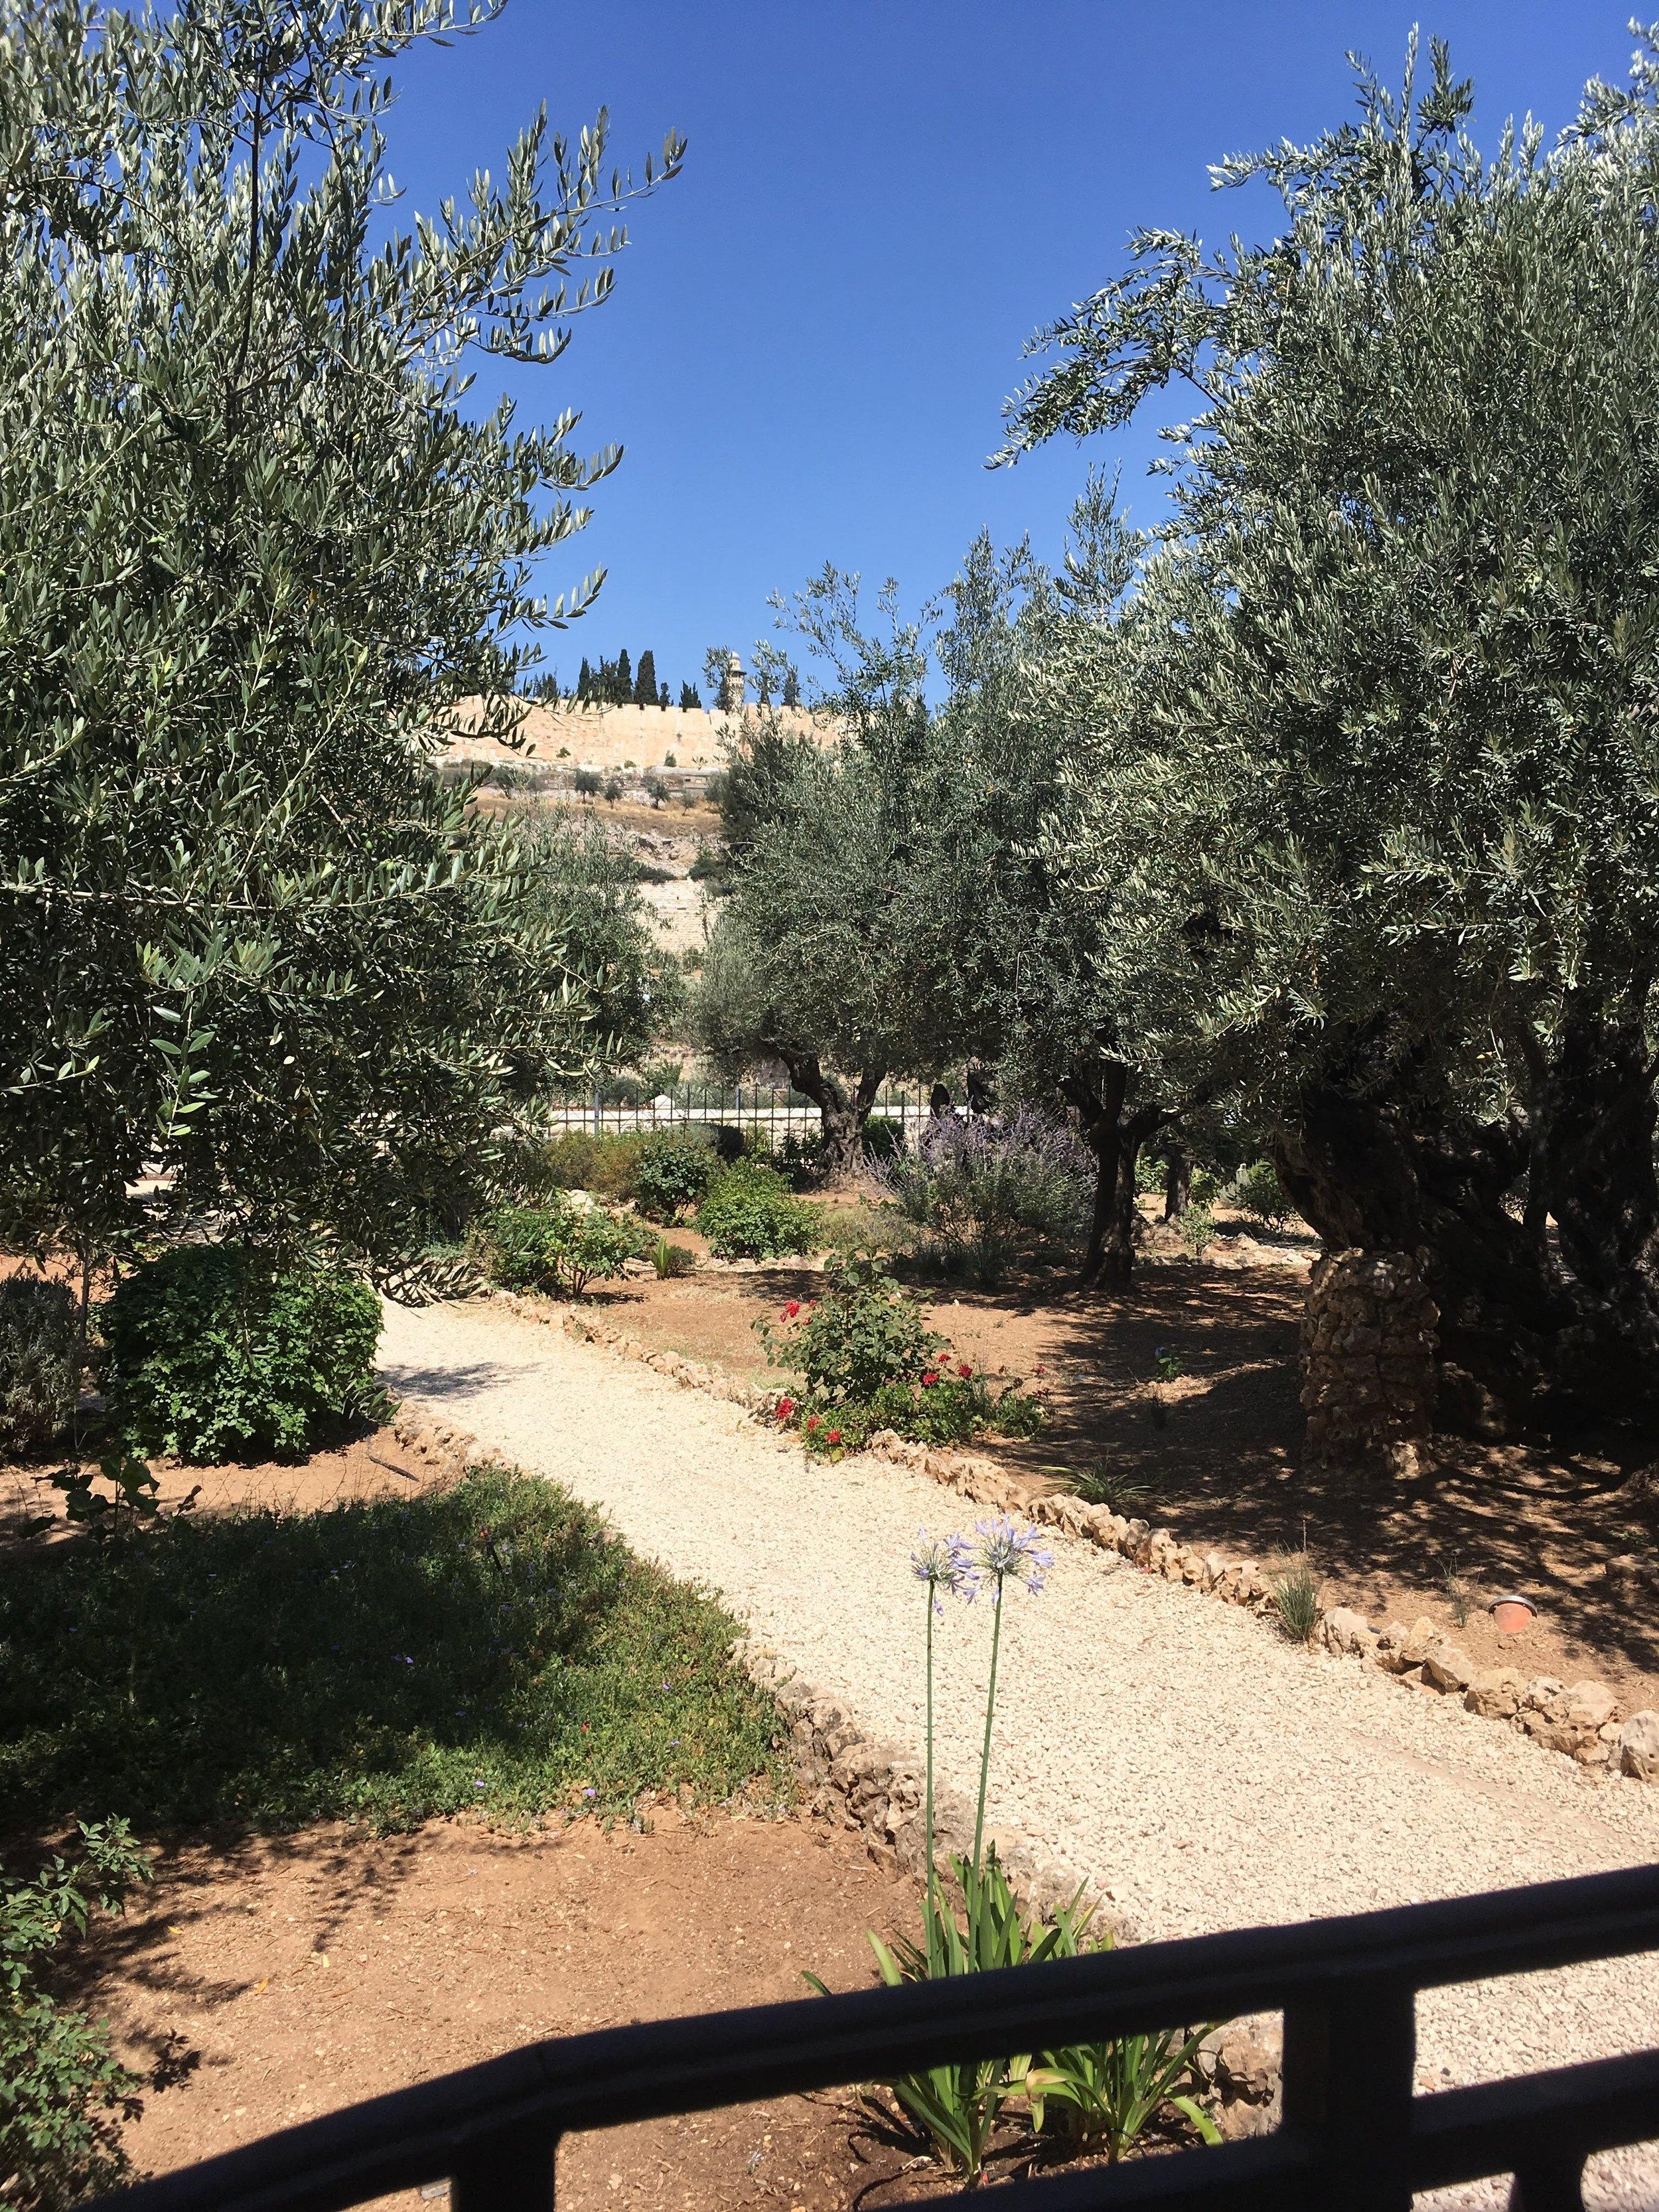 The Garden of Gethsemane, where Jesus prayed